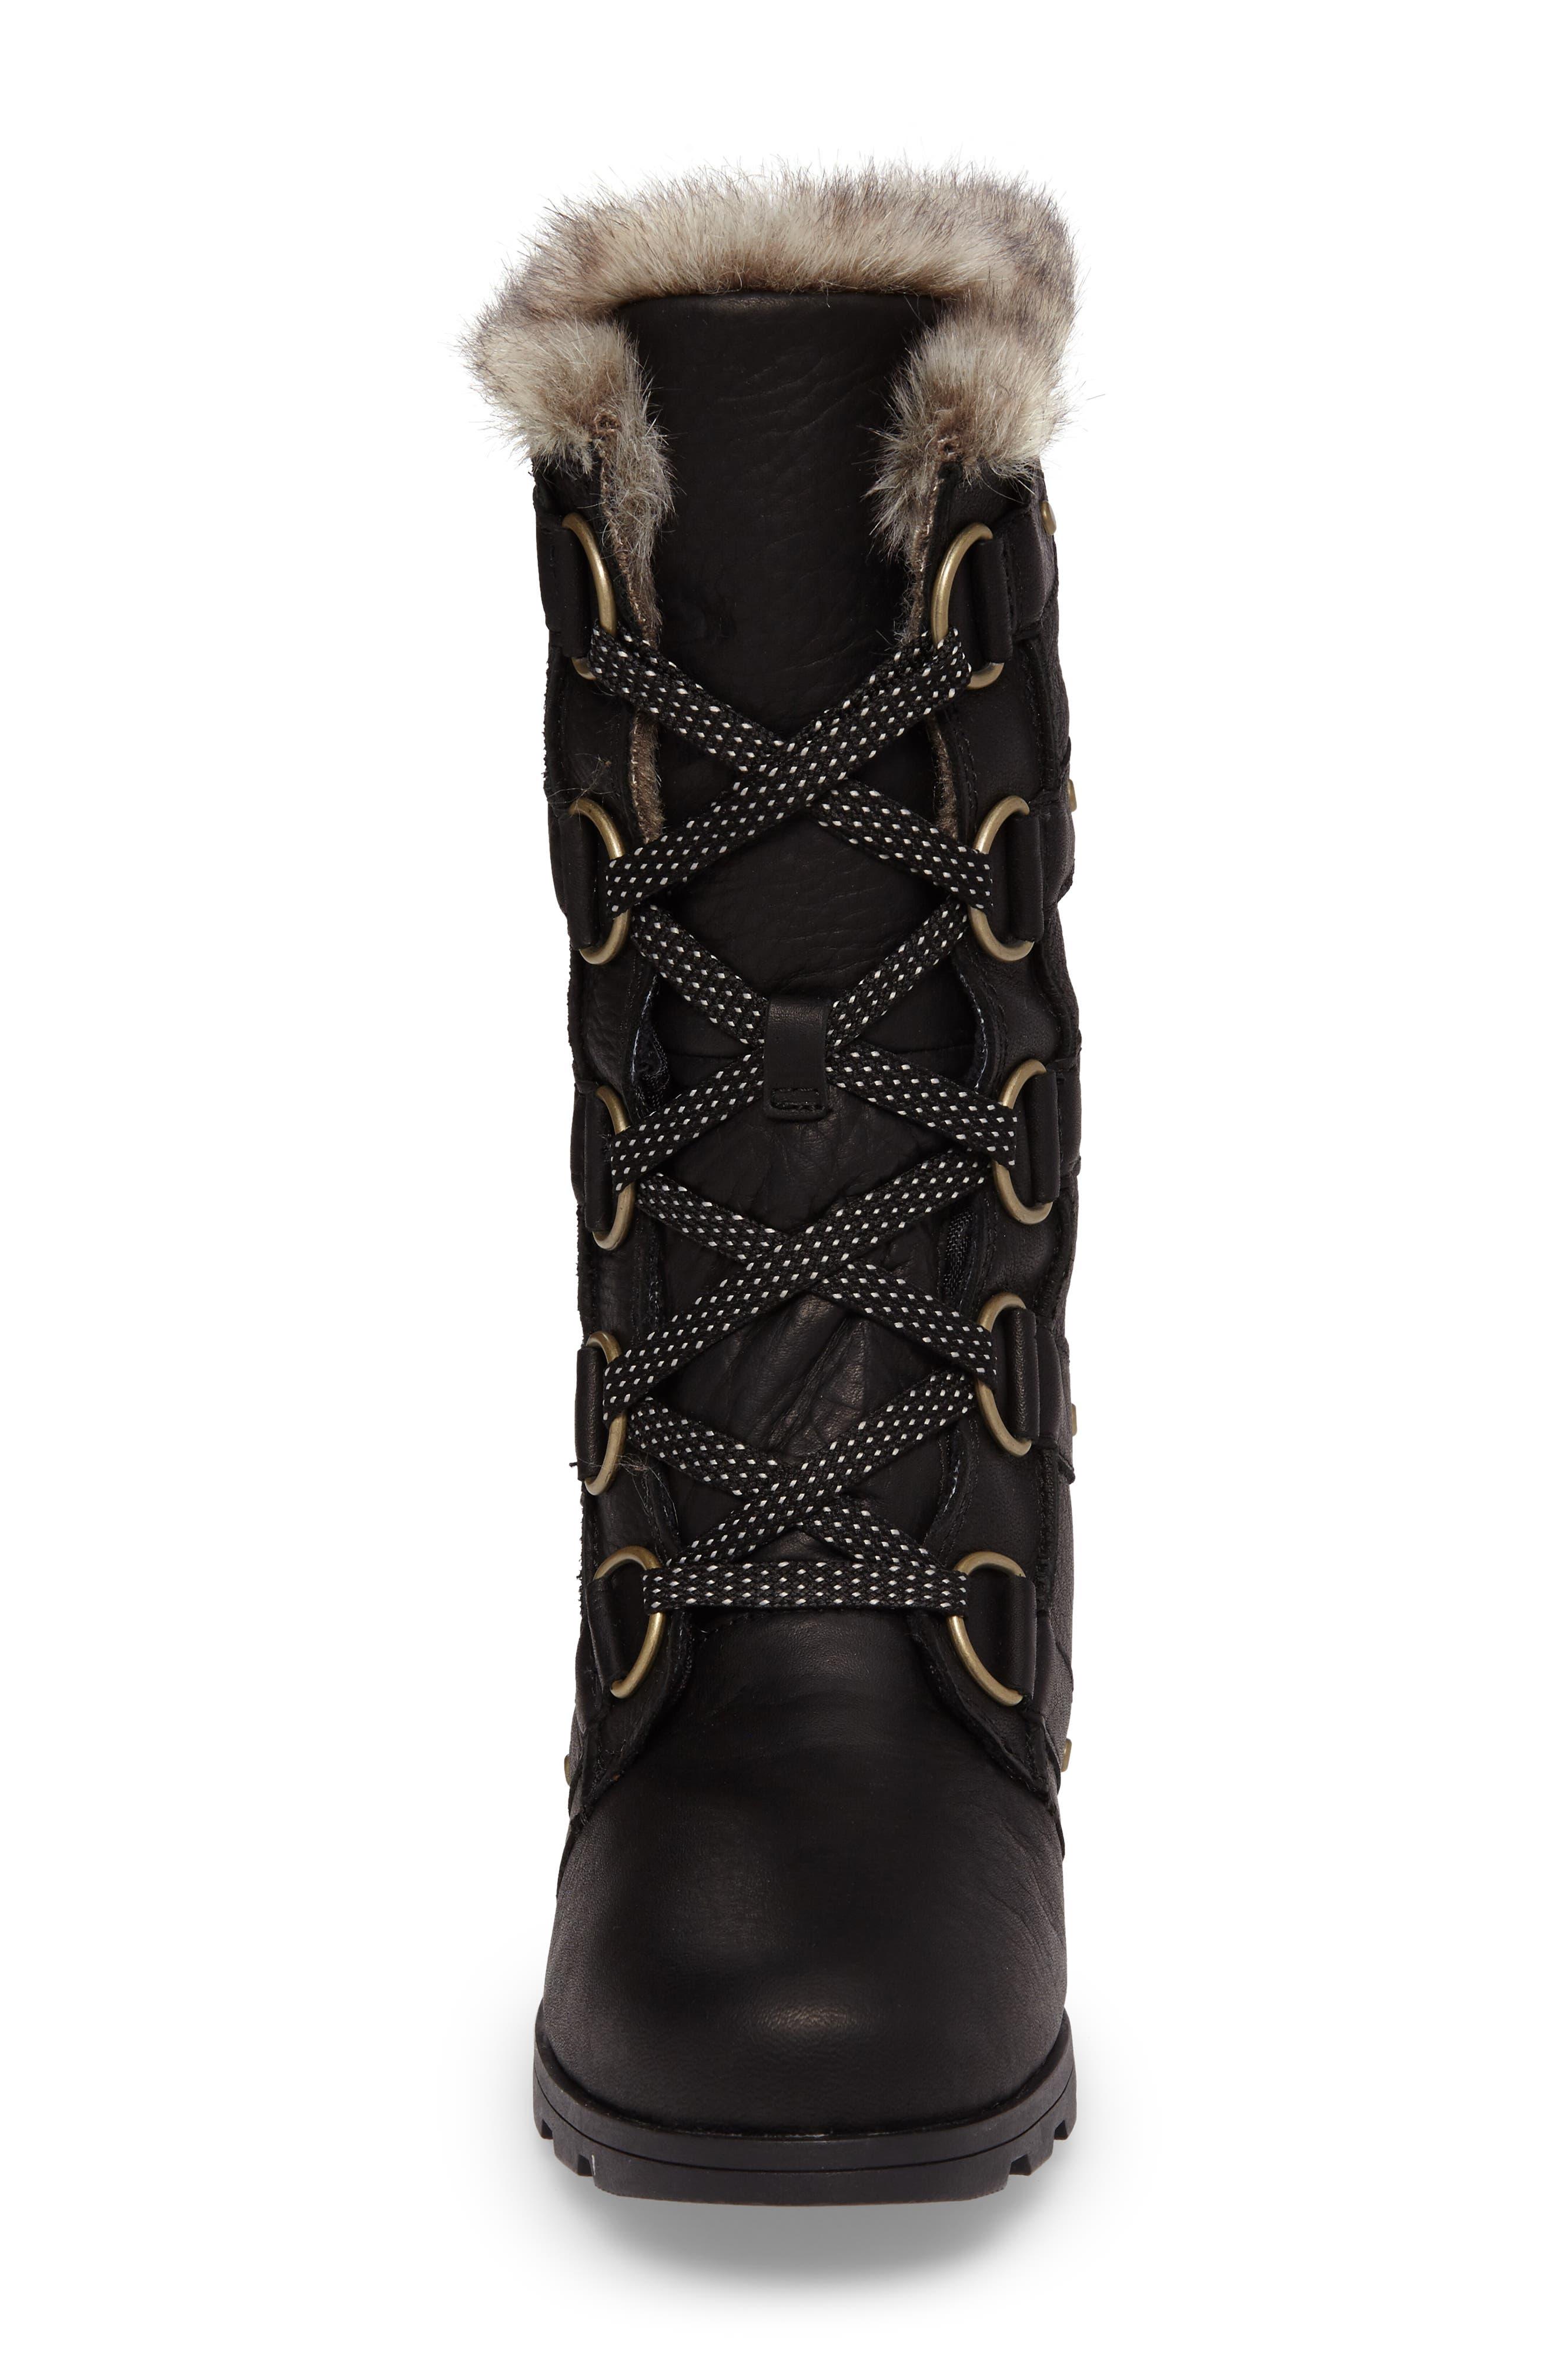 Emelie Waterproof Lace Up Boot with Faux Fur Trim,                             Alternate thumbnail 4, color,                             010